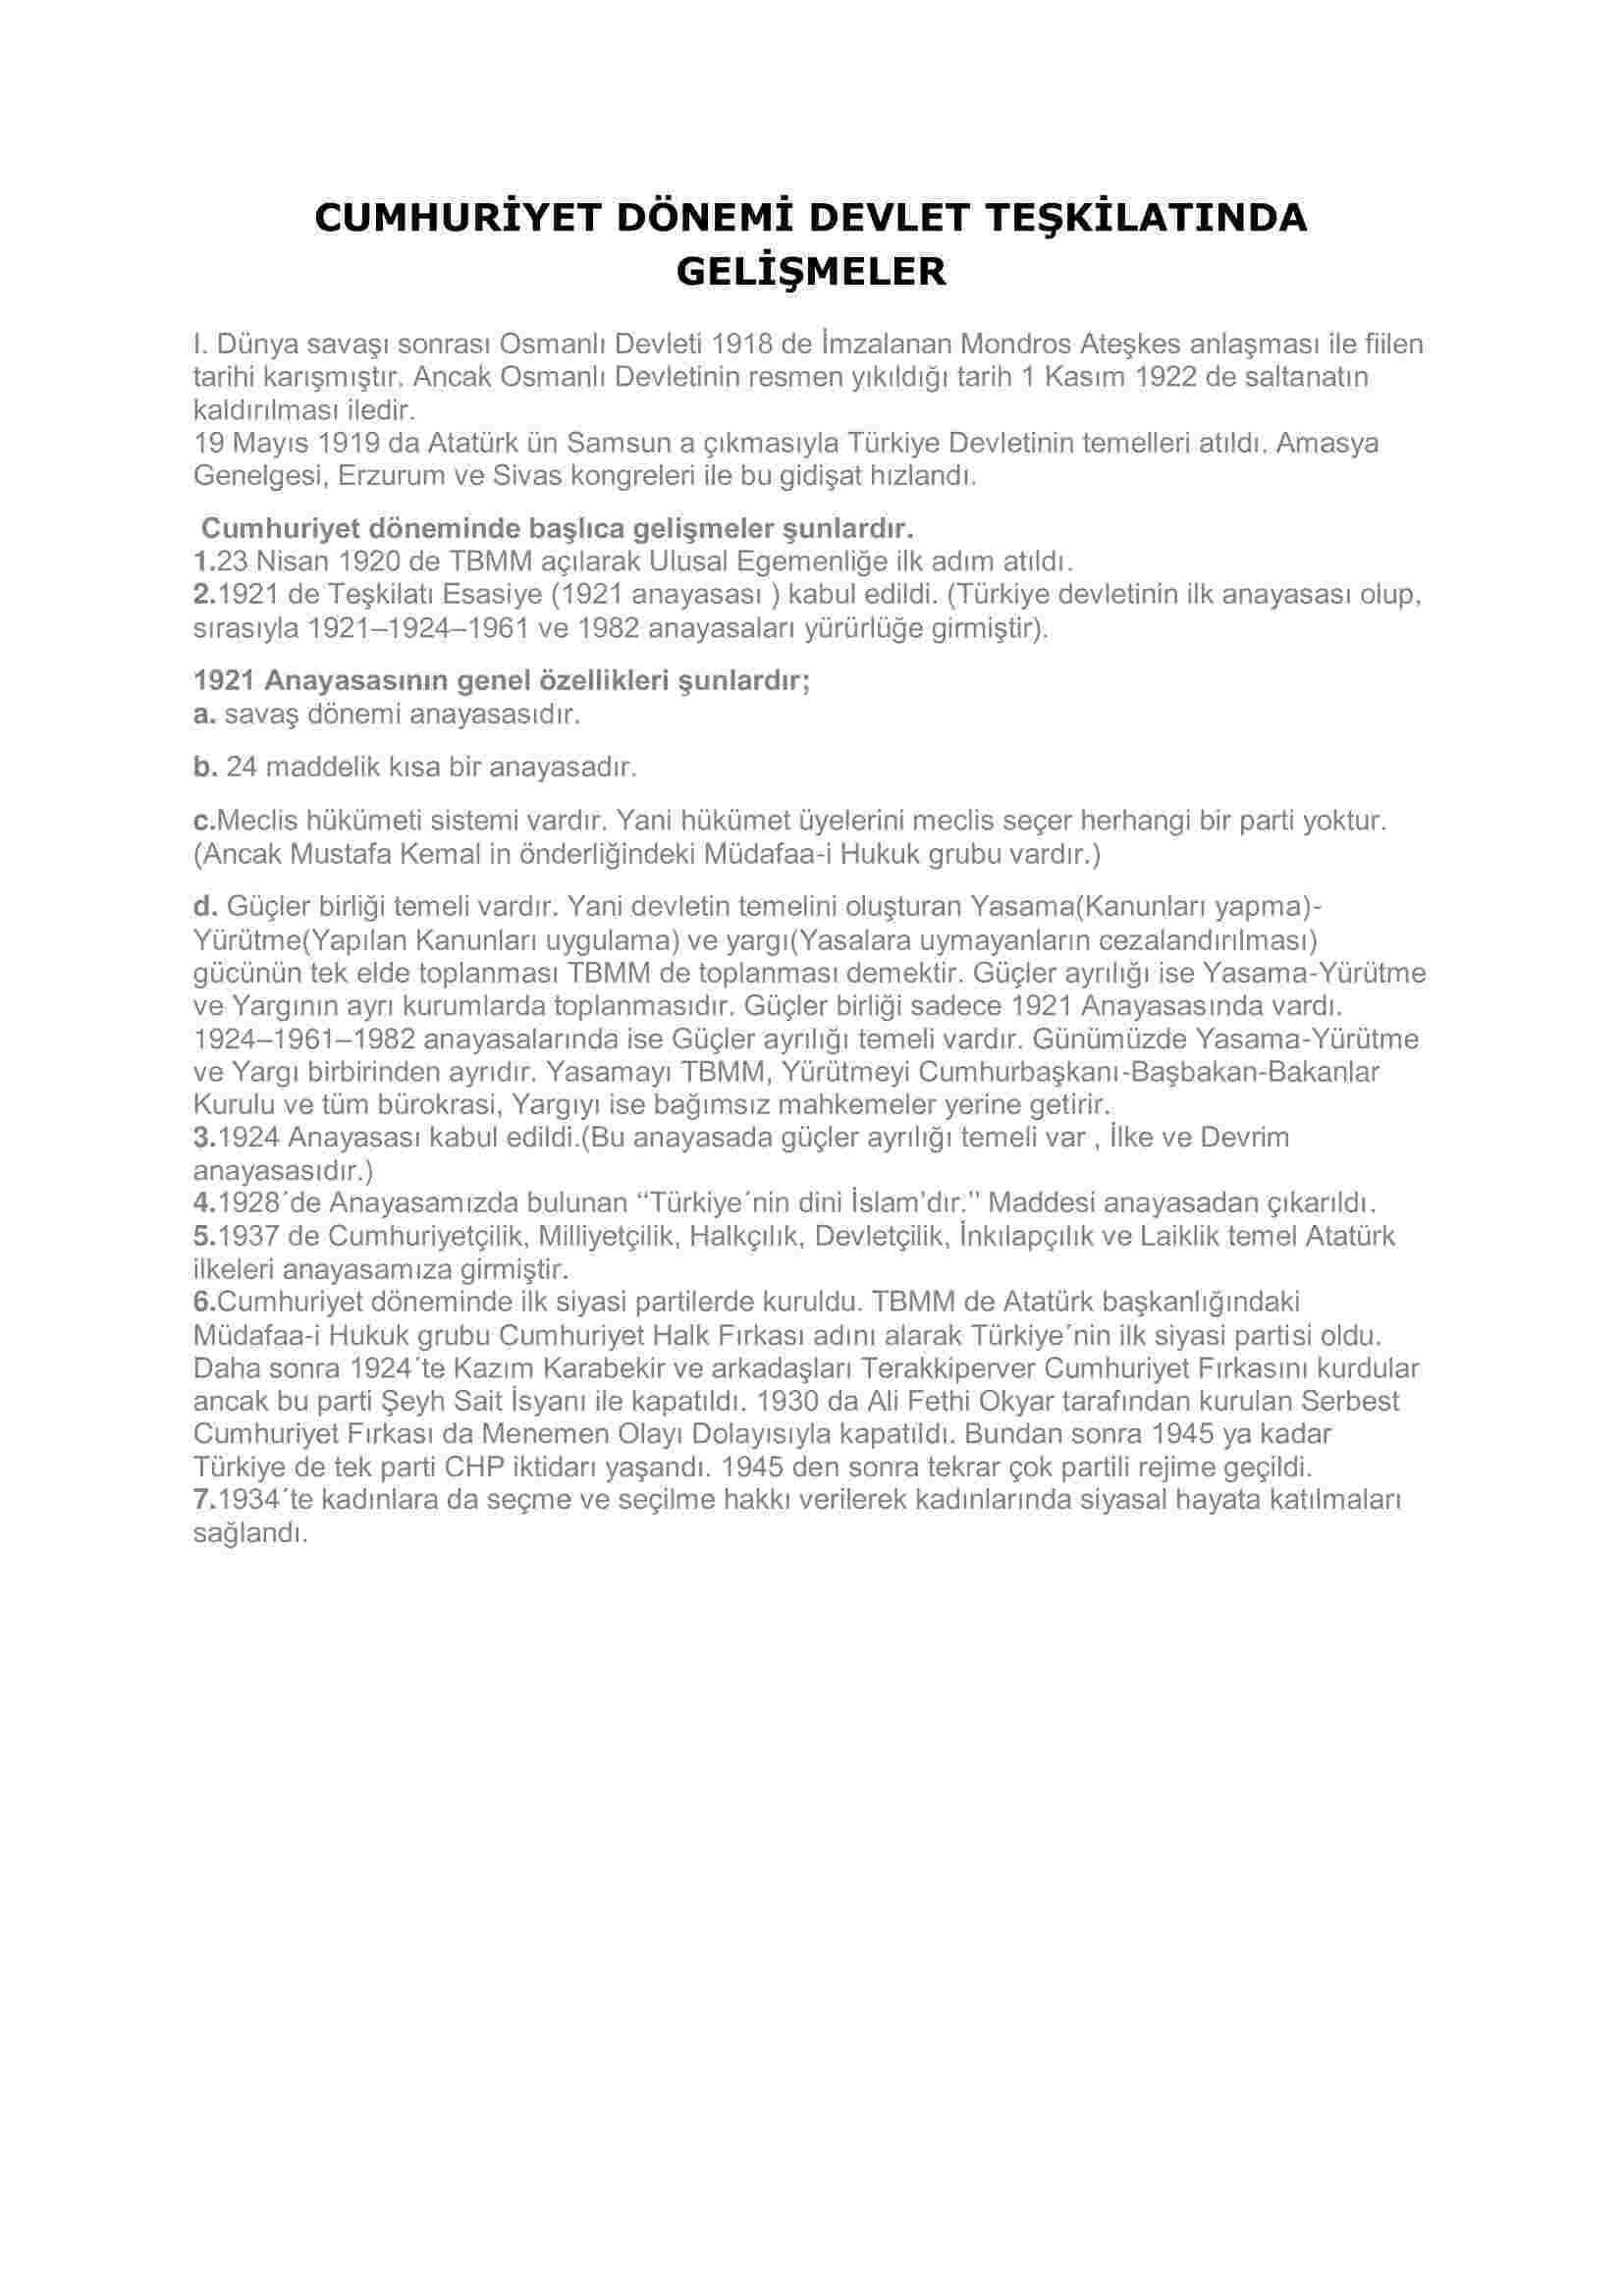 cumhuriyet-donemi-devlet-teskilatinda-gelismeler